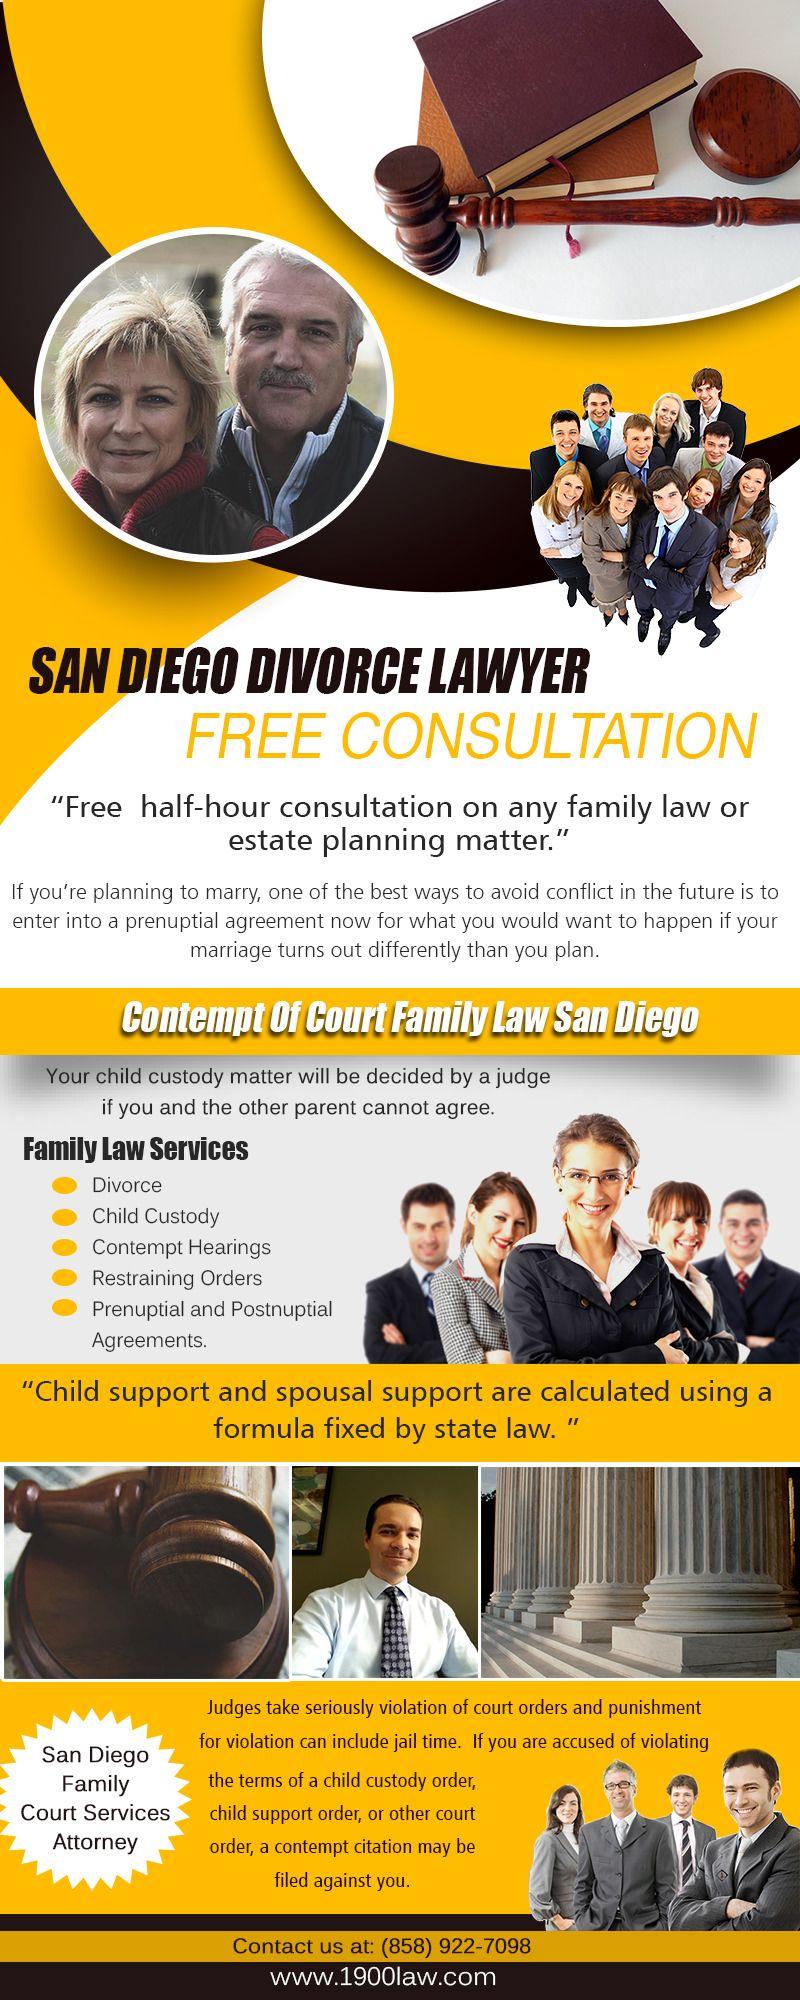 Divorce Attorney in San Diego Divorce, Family law